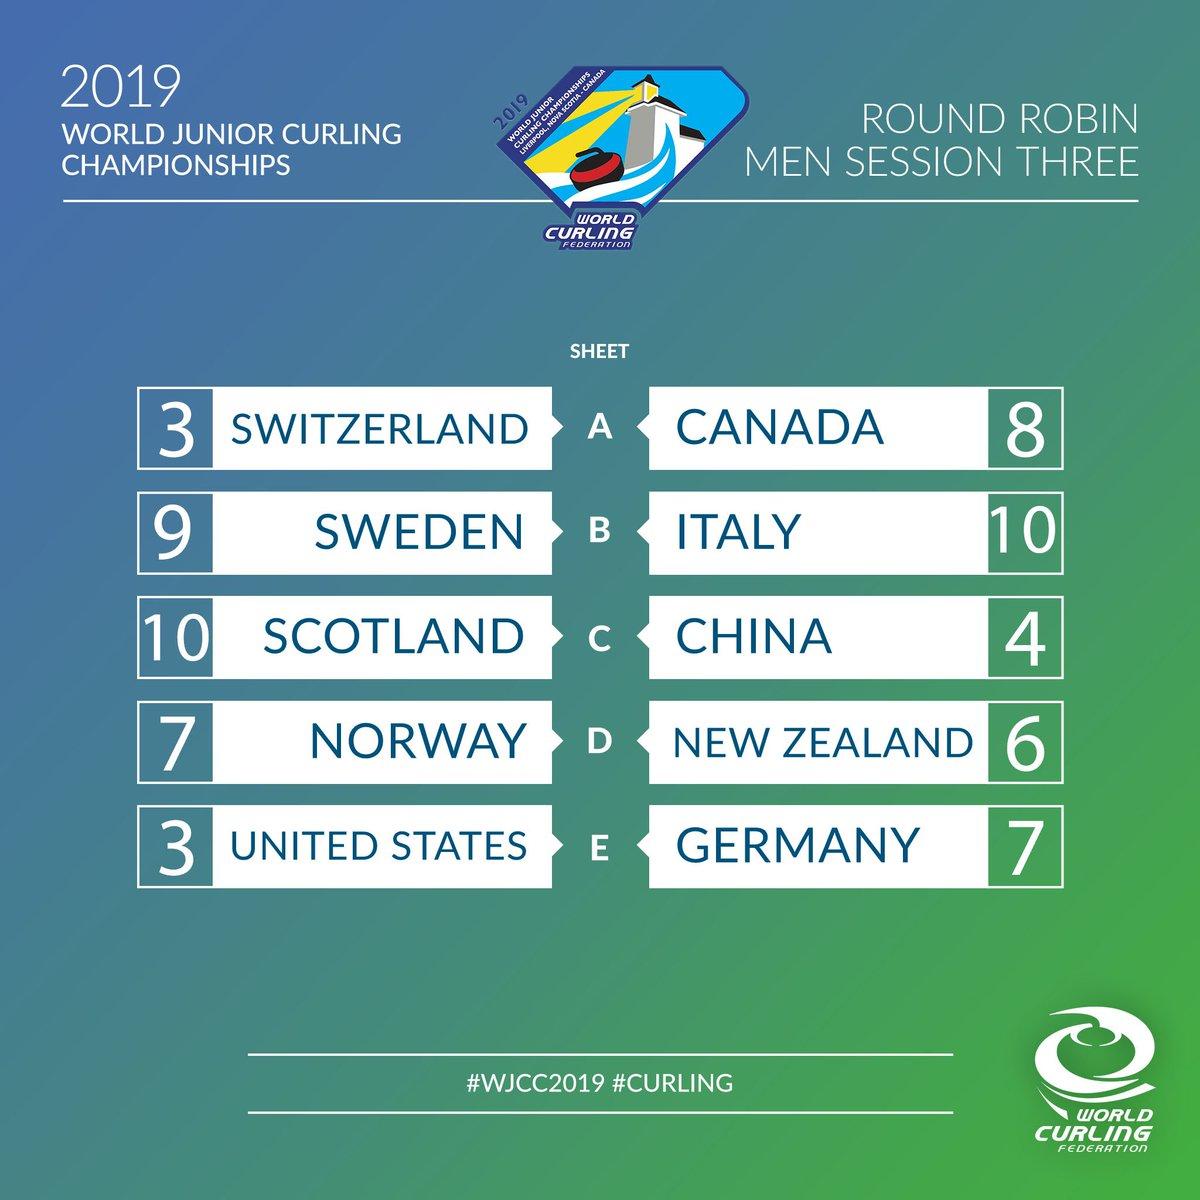 World Curling on Twitter: